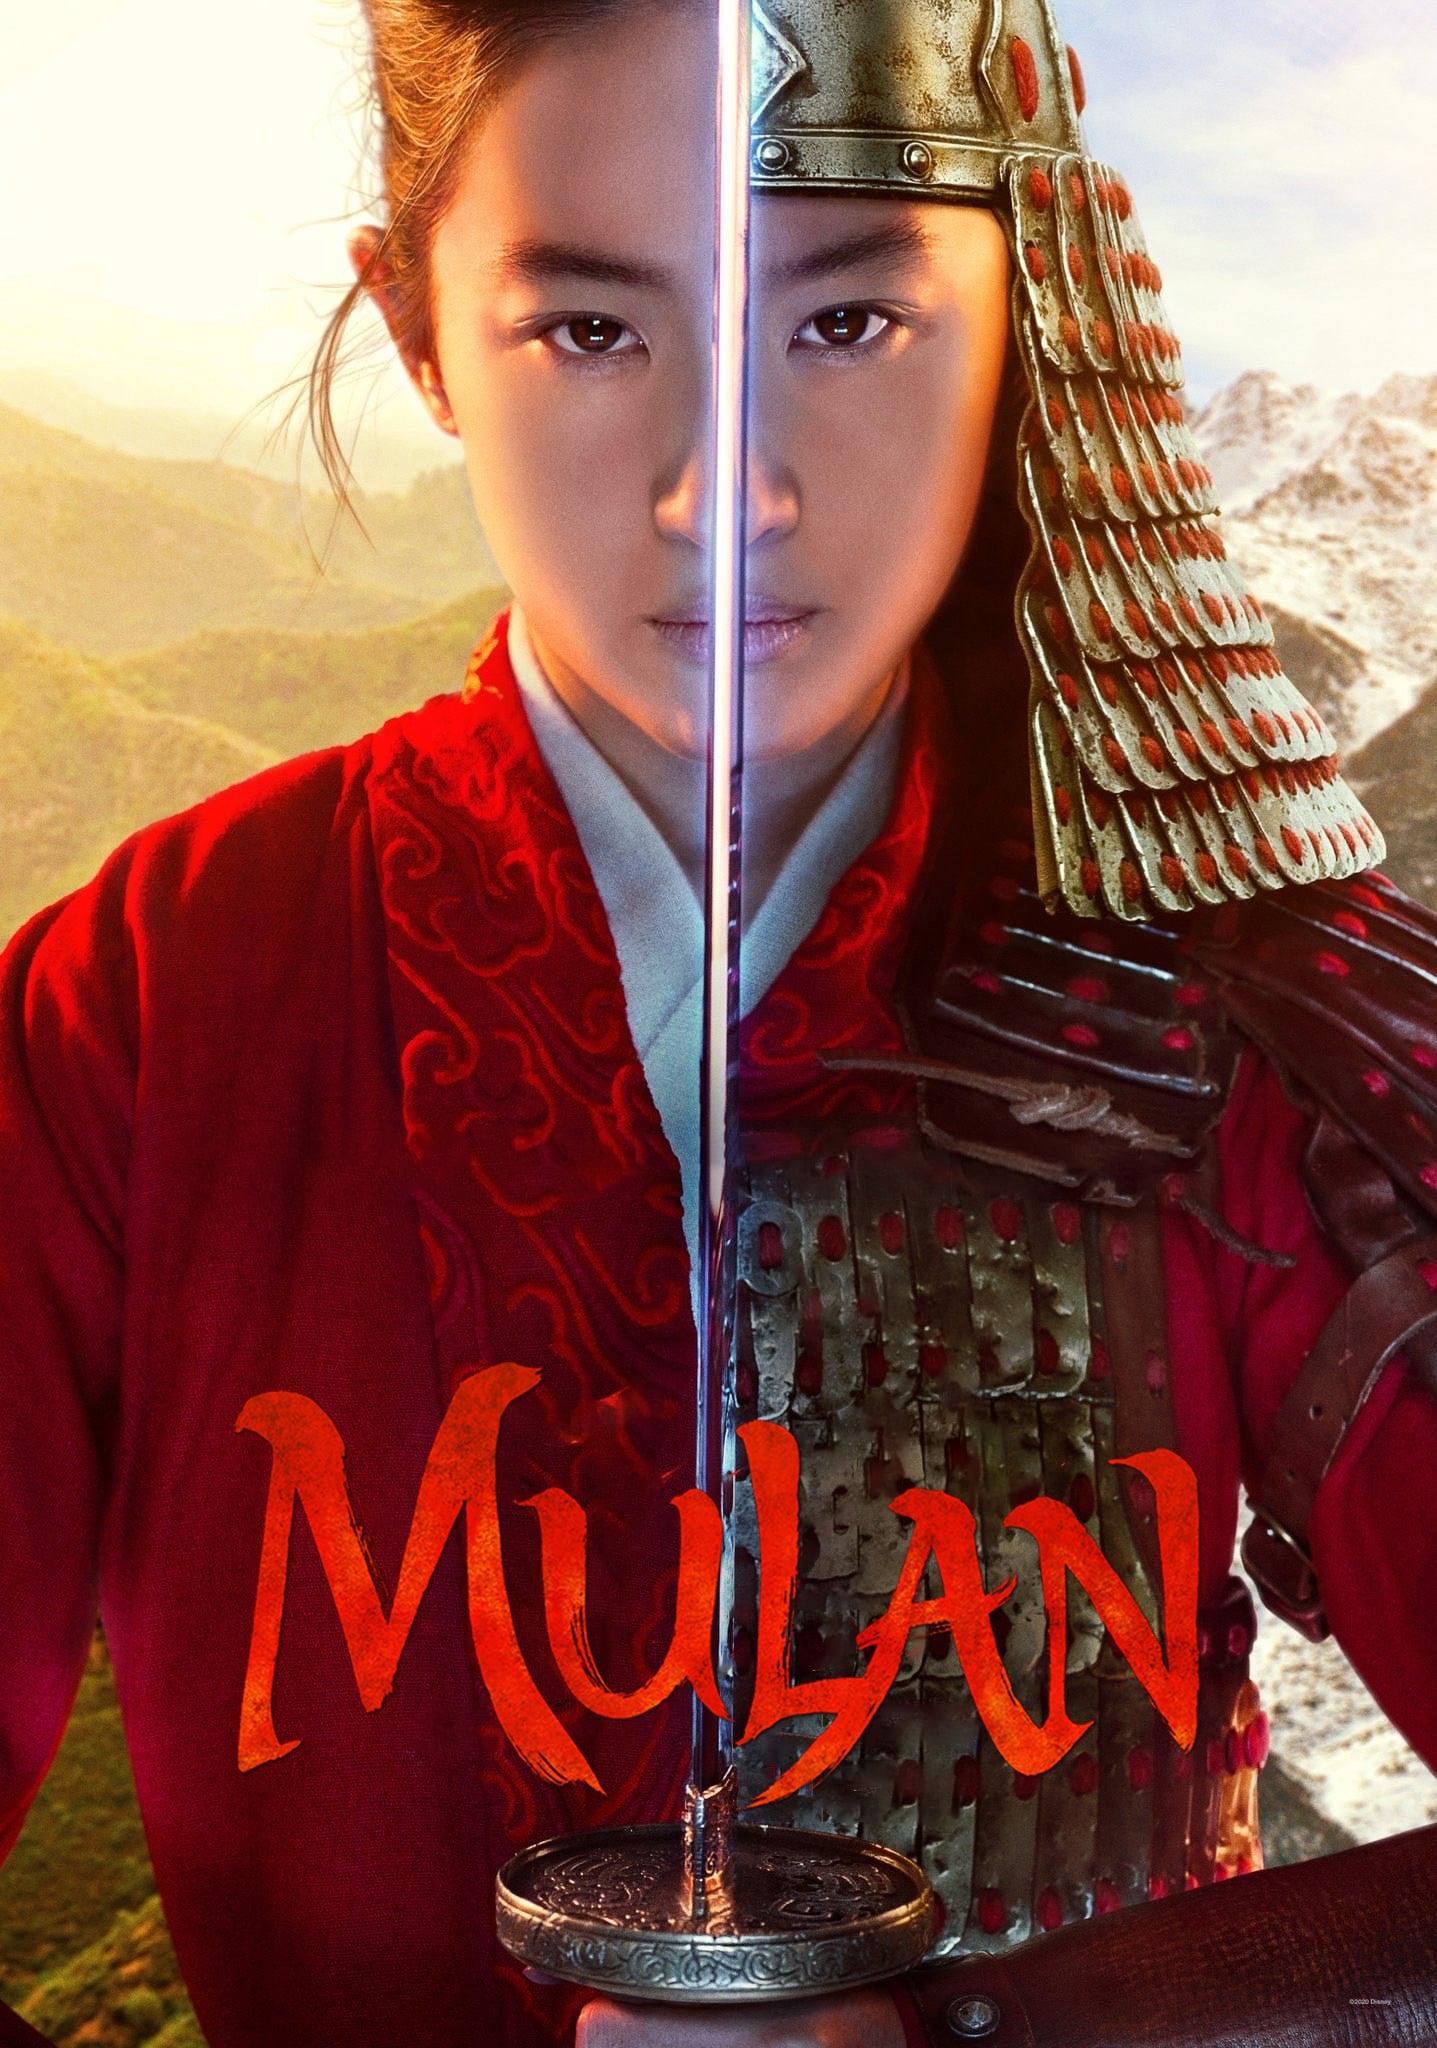 Mulan 2020 Digital 4k Uhd 3 Vudu Credit Vudu Preorder 29 99